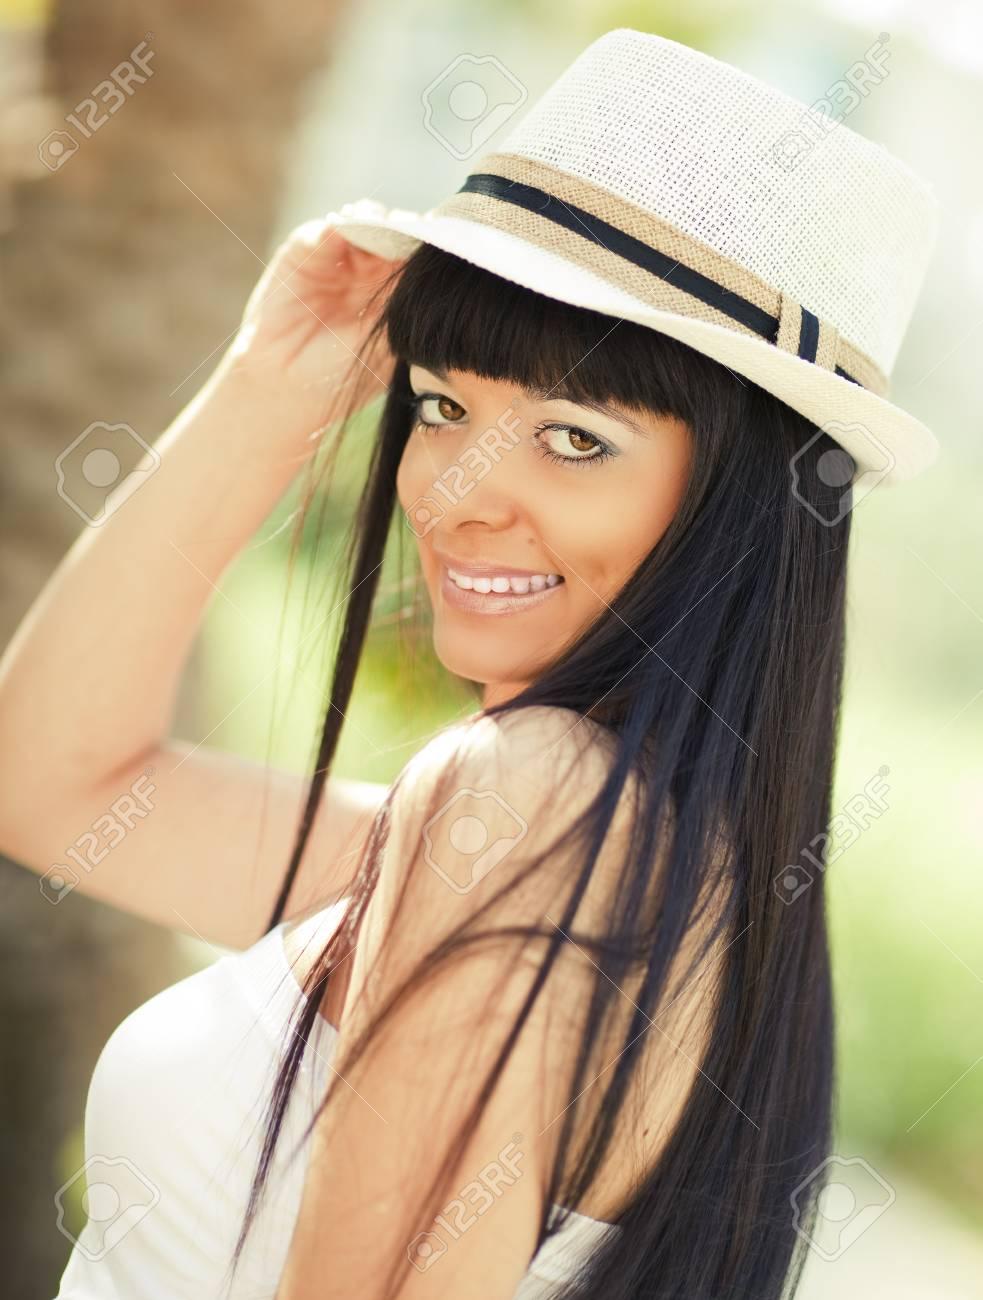 Young beautiful girl looking at camera and smiling Stock Photo - 13510947